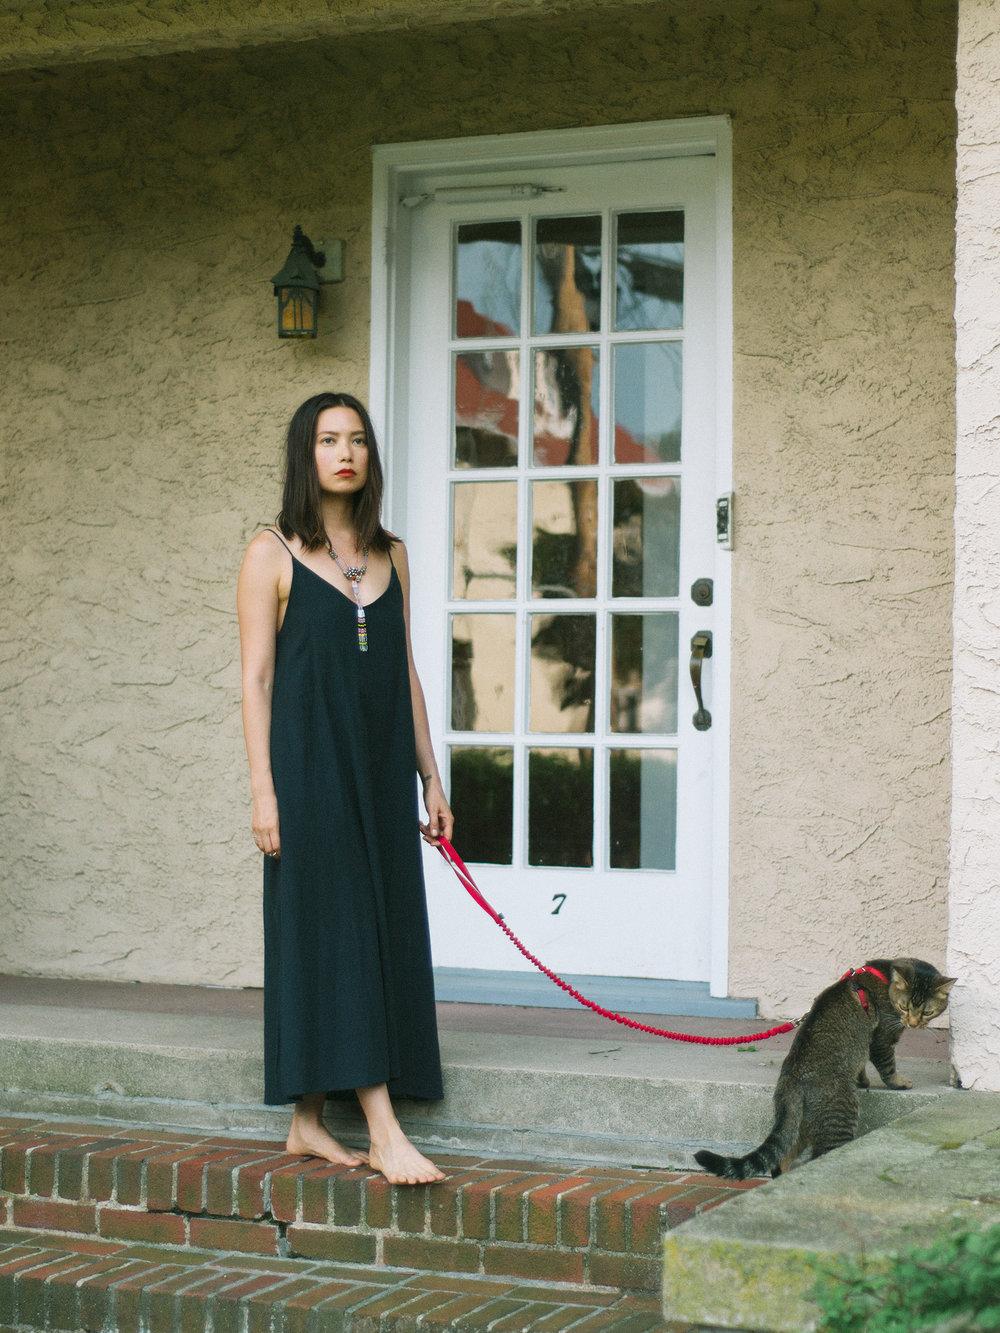 Par en Par _ At Home _ Justine Sweetman 3.jpg